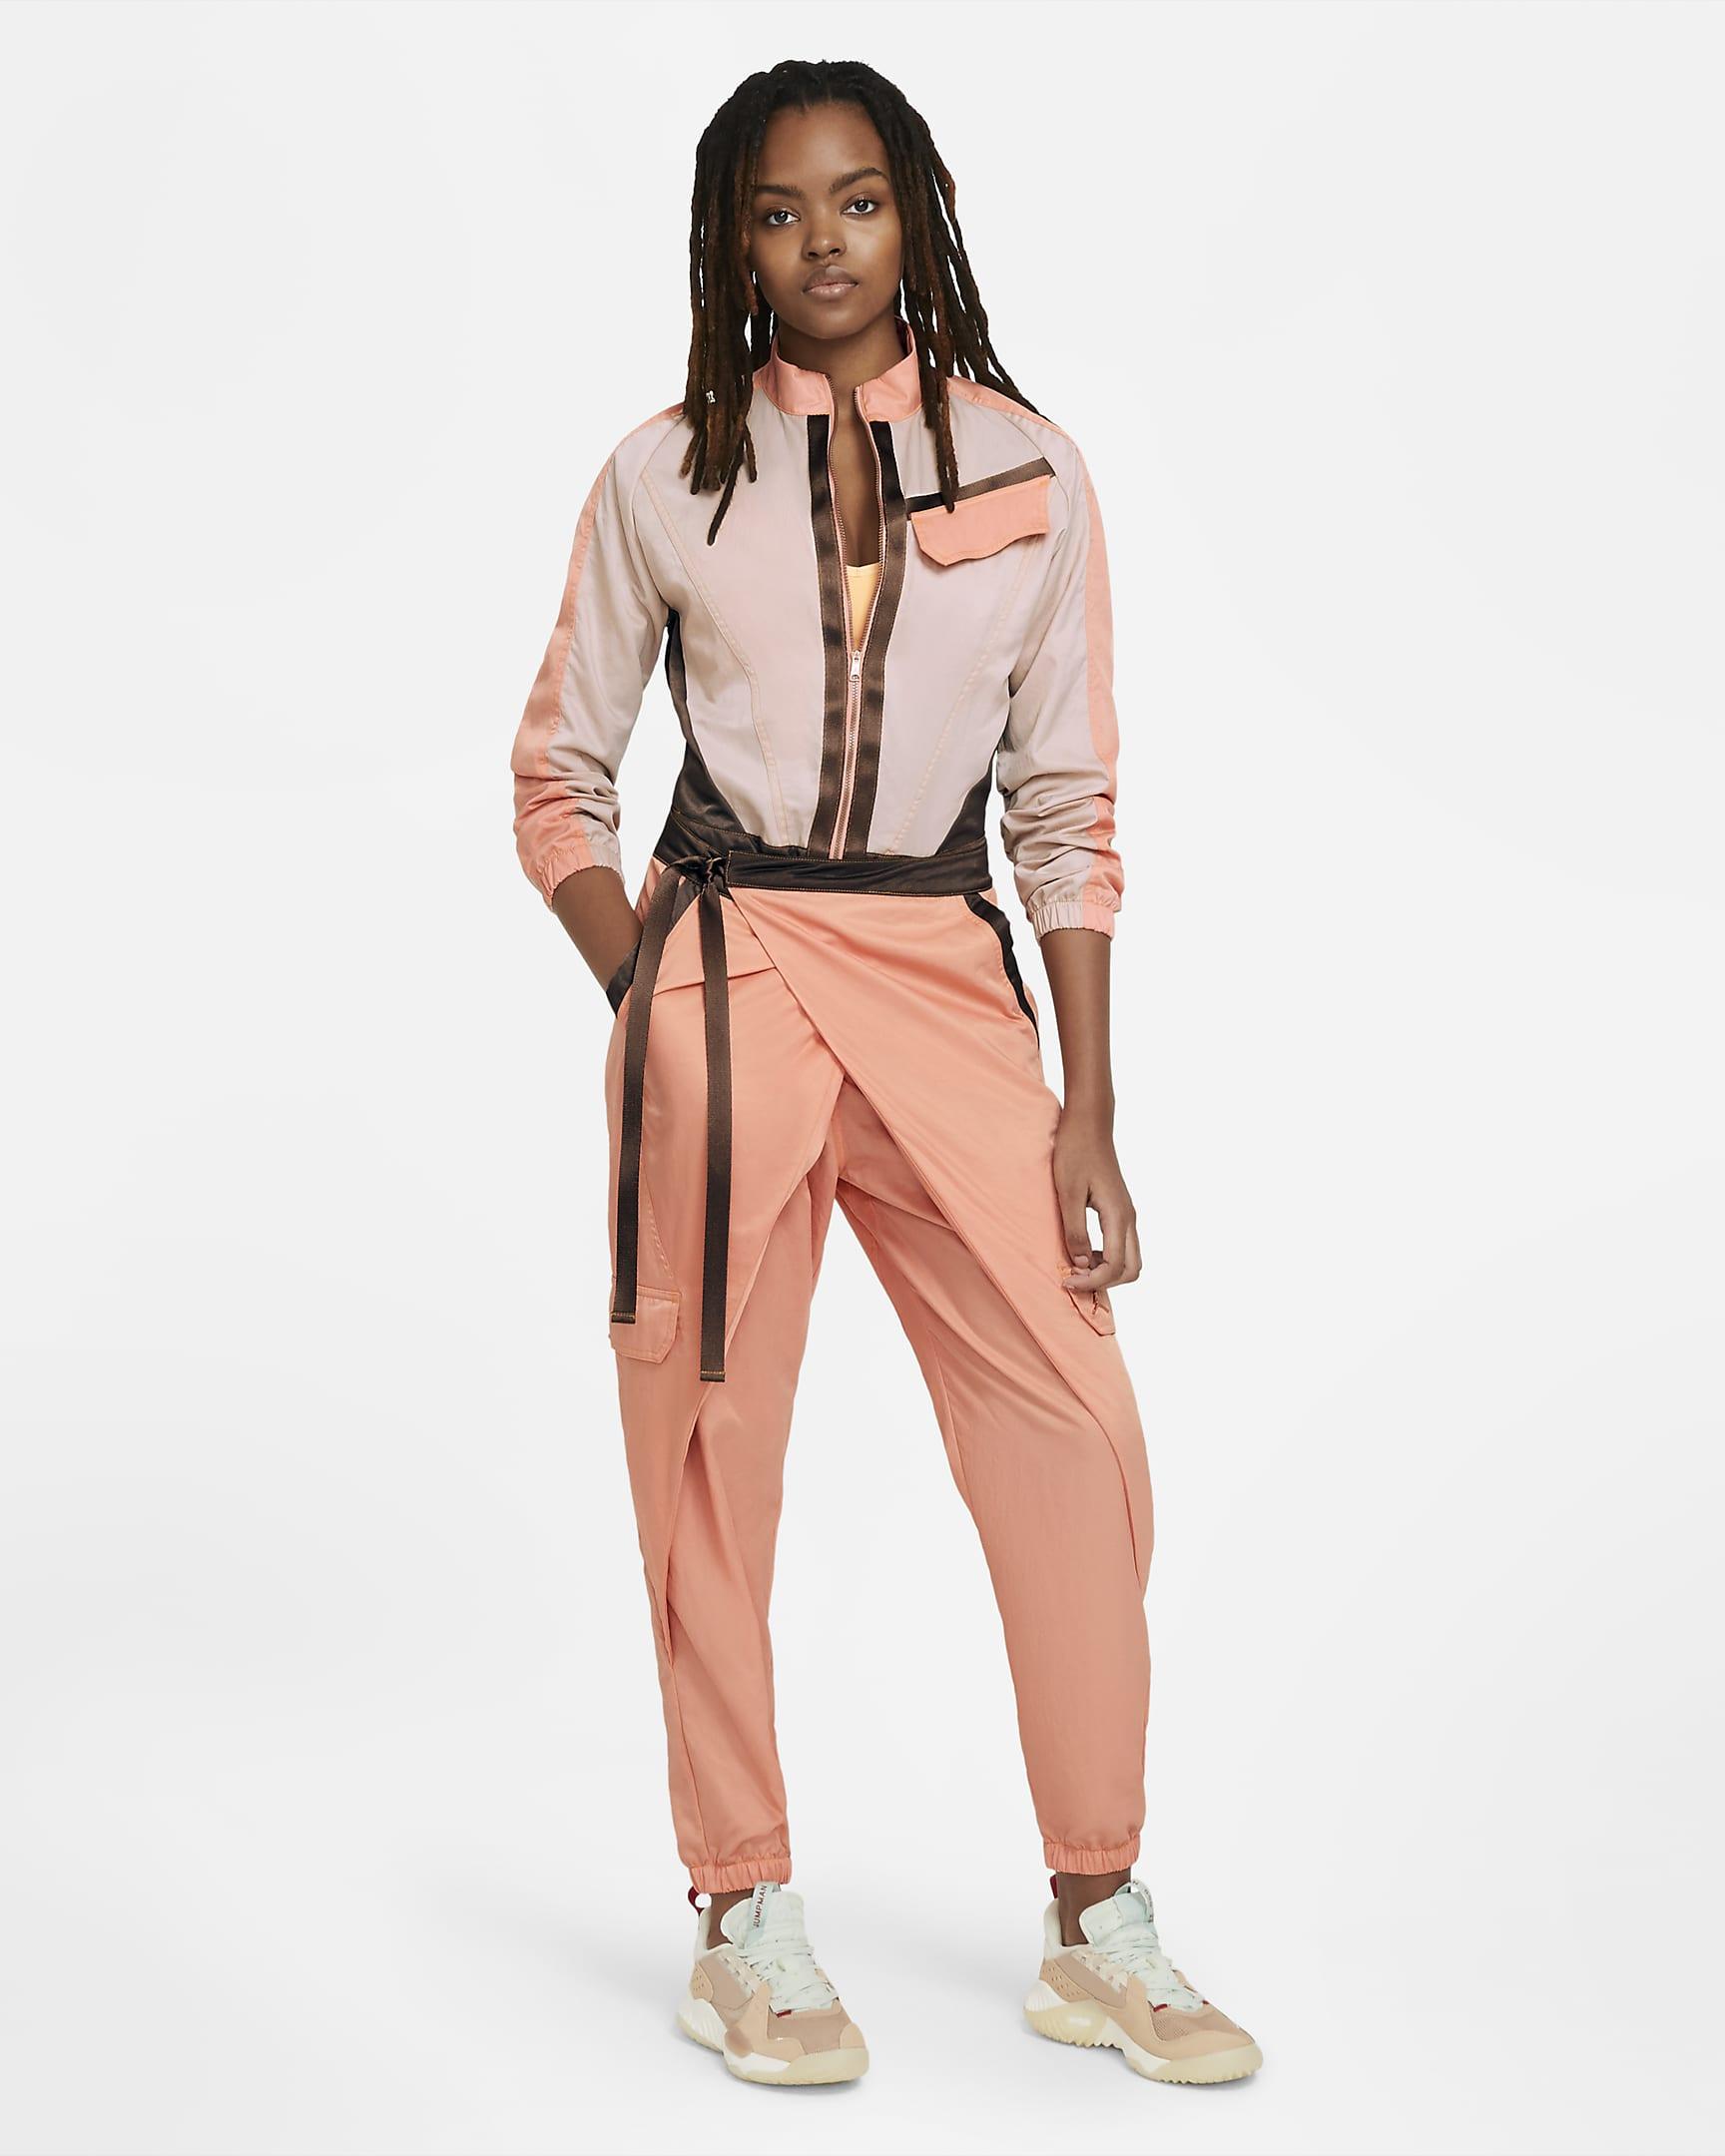 jordan-future-primal-womens-flight-suit-jxjT6b